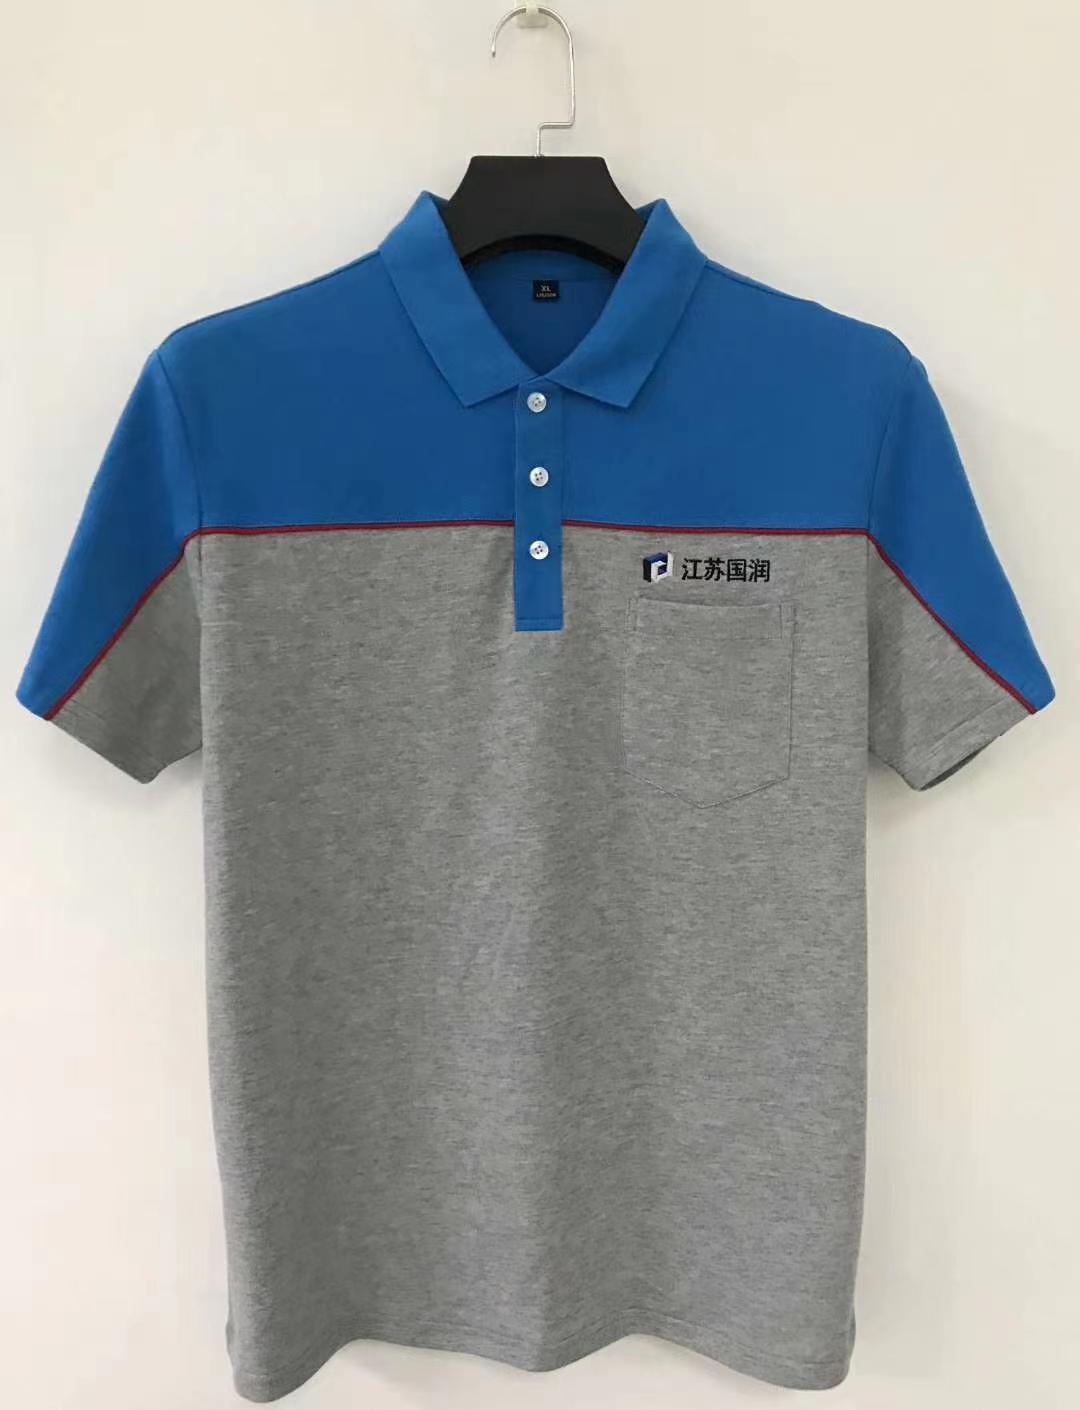 High Quality Cotton Pique Mesh Polo Shirt/Tshirt work cloth 4